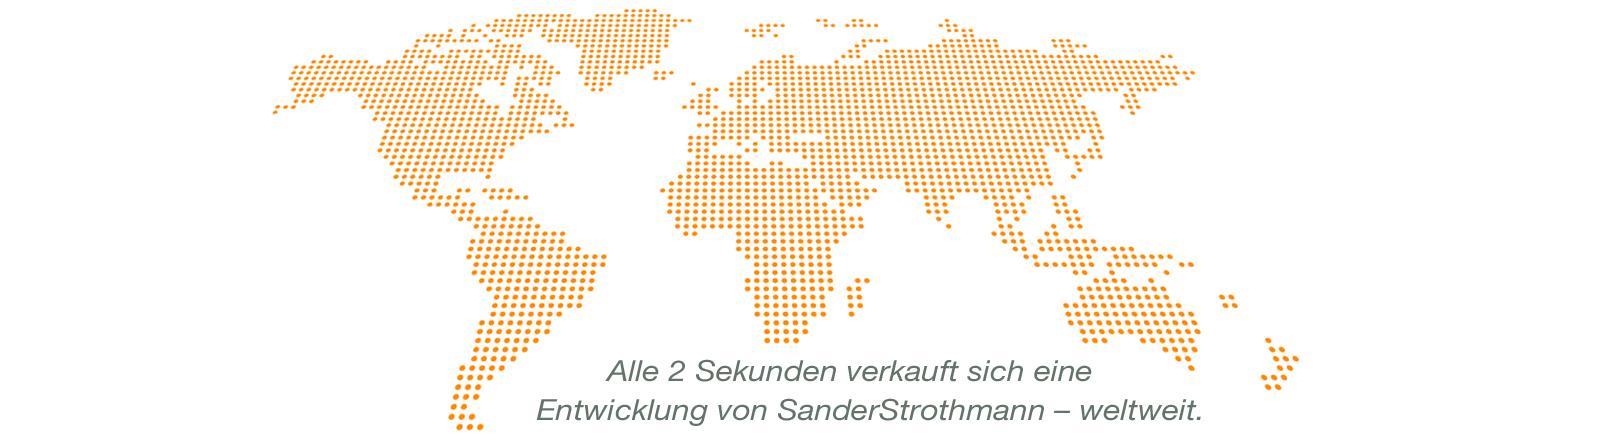 SanderStrothmann-Story1